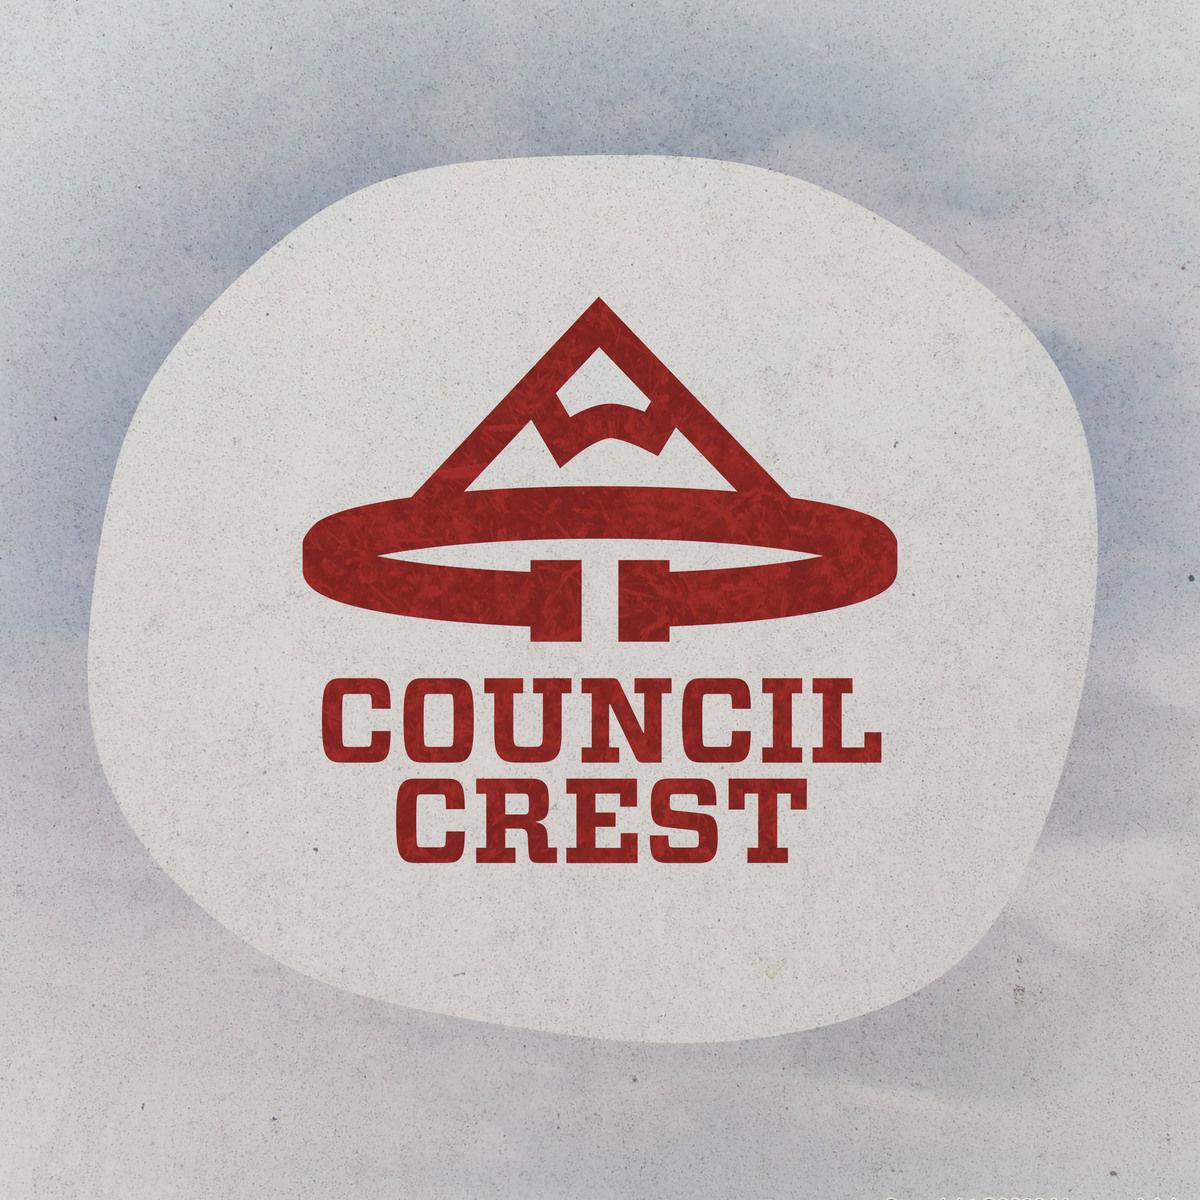 031 councilcrest iqqn2f